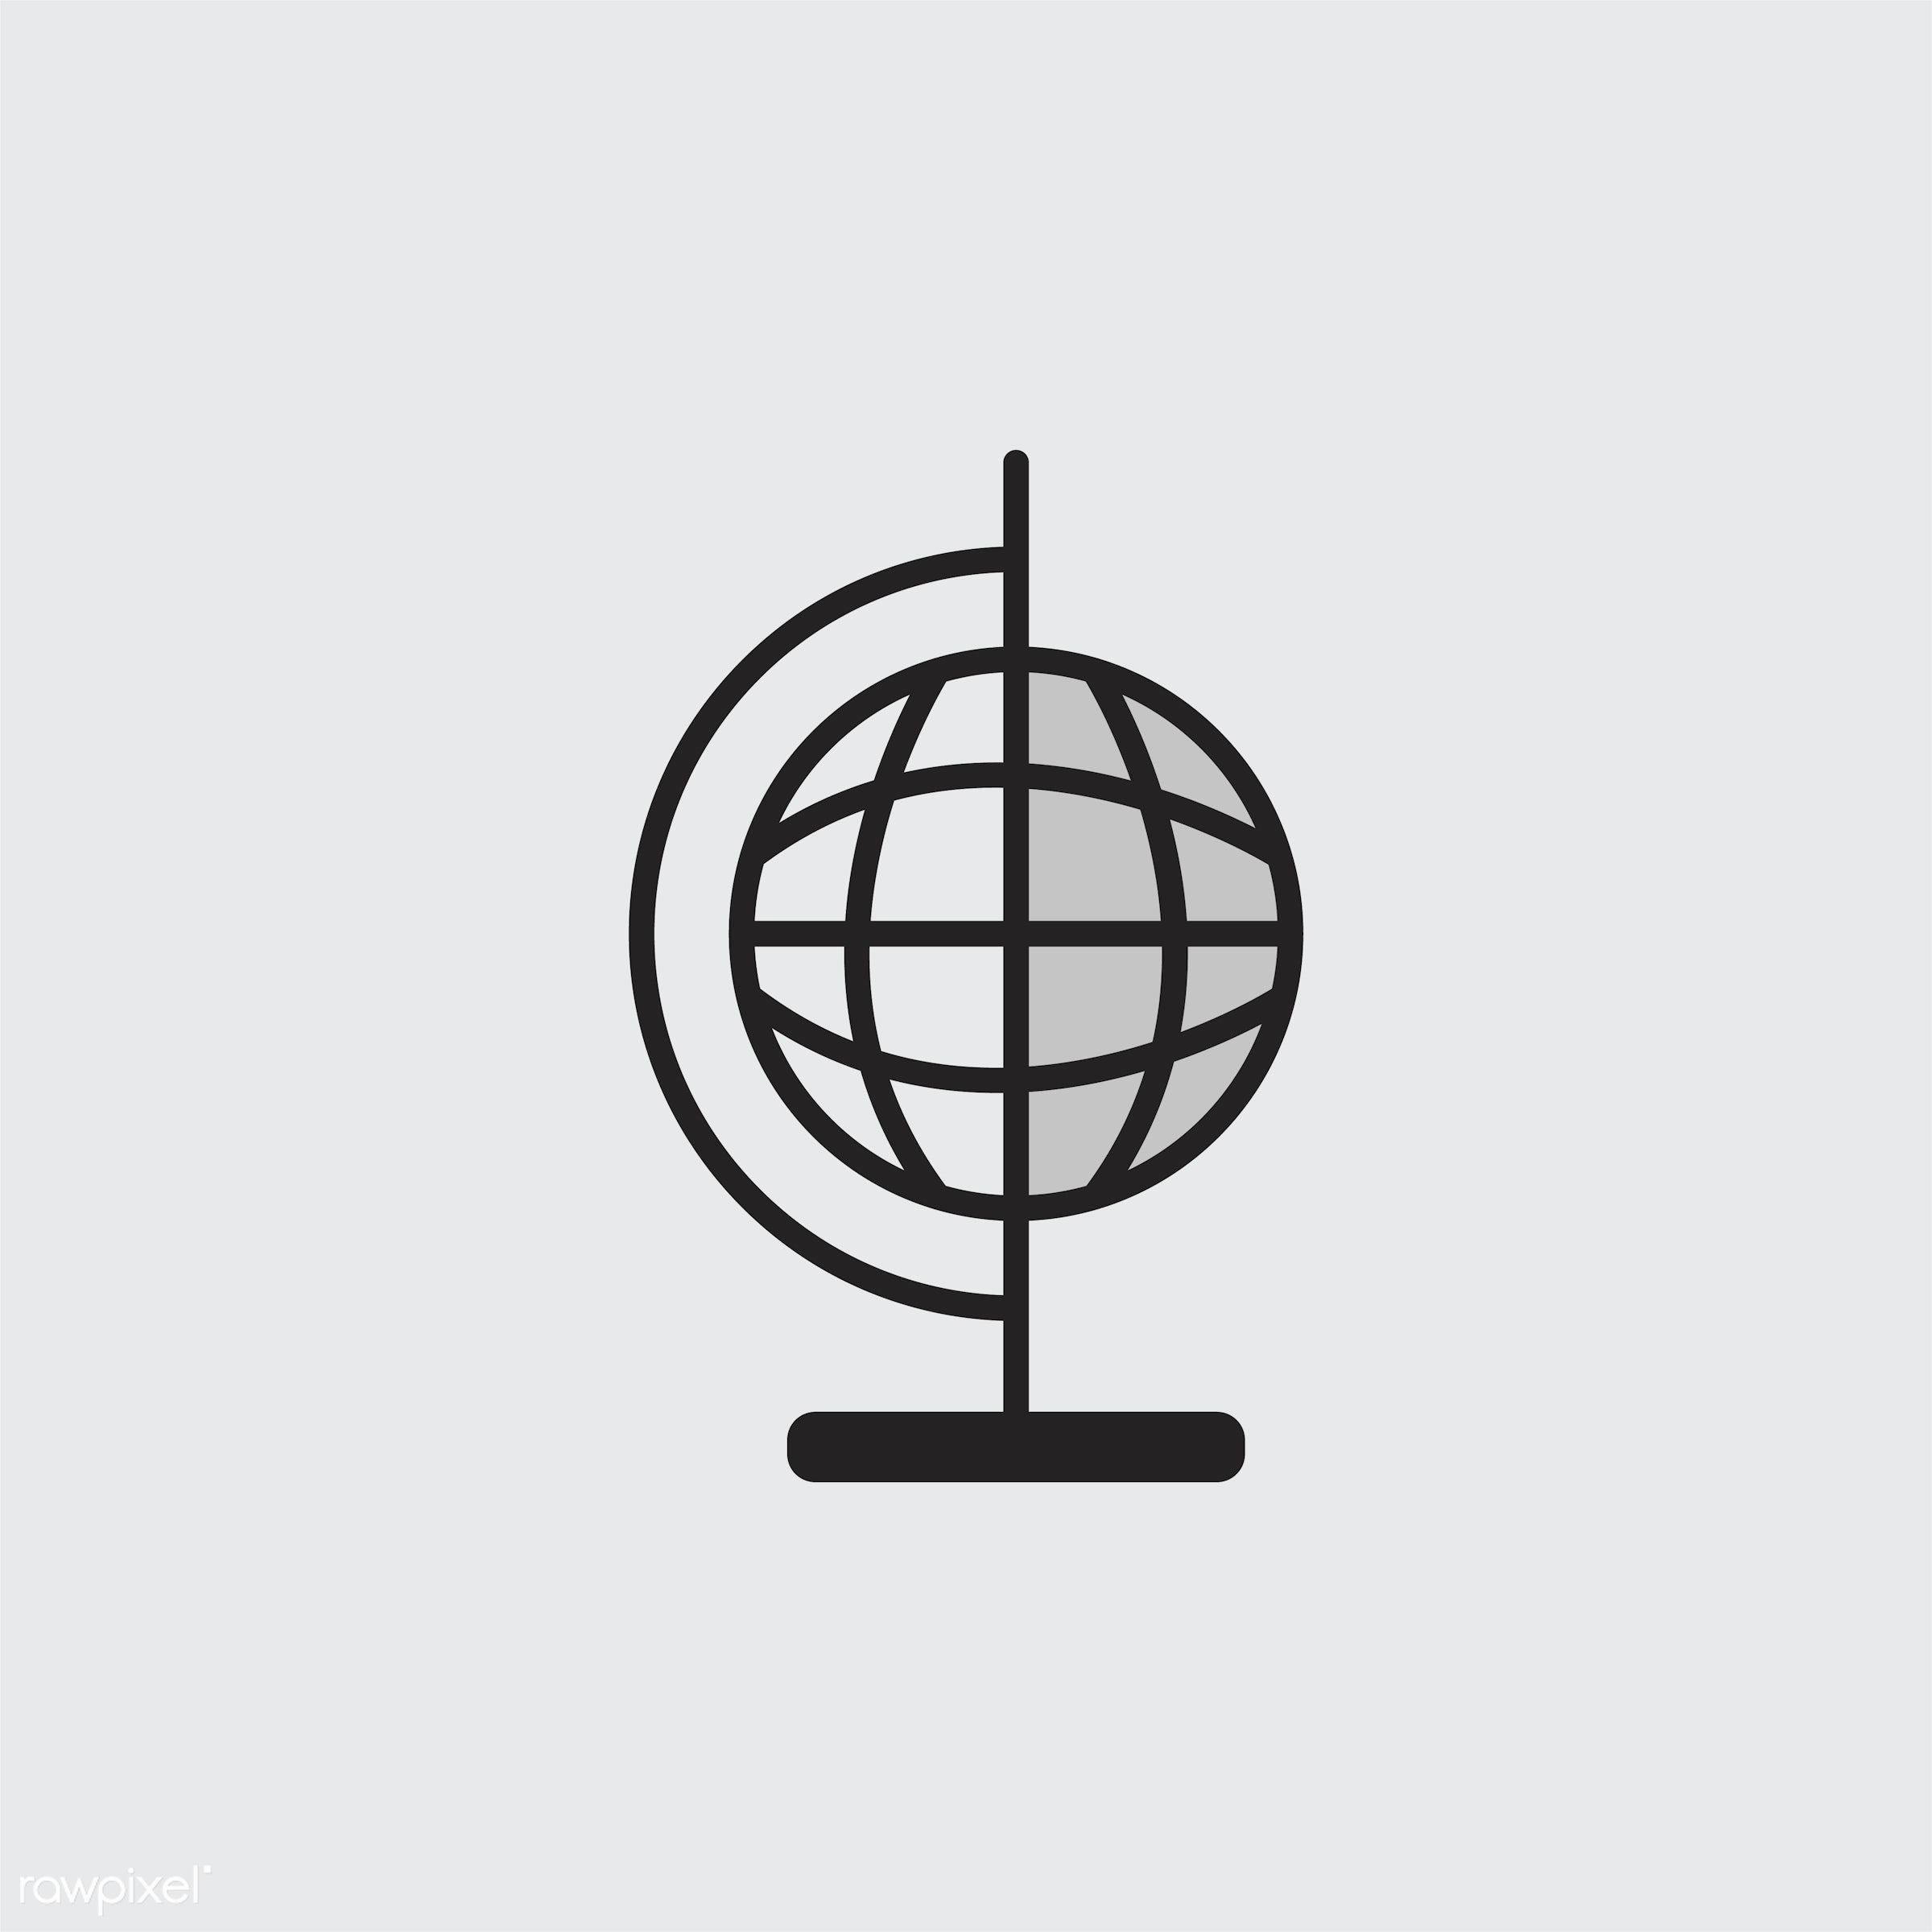 Illustration of globe ball - ball, biology, chemistry, class, design, education, equipment, experiments, global, globe,...